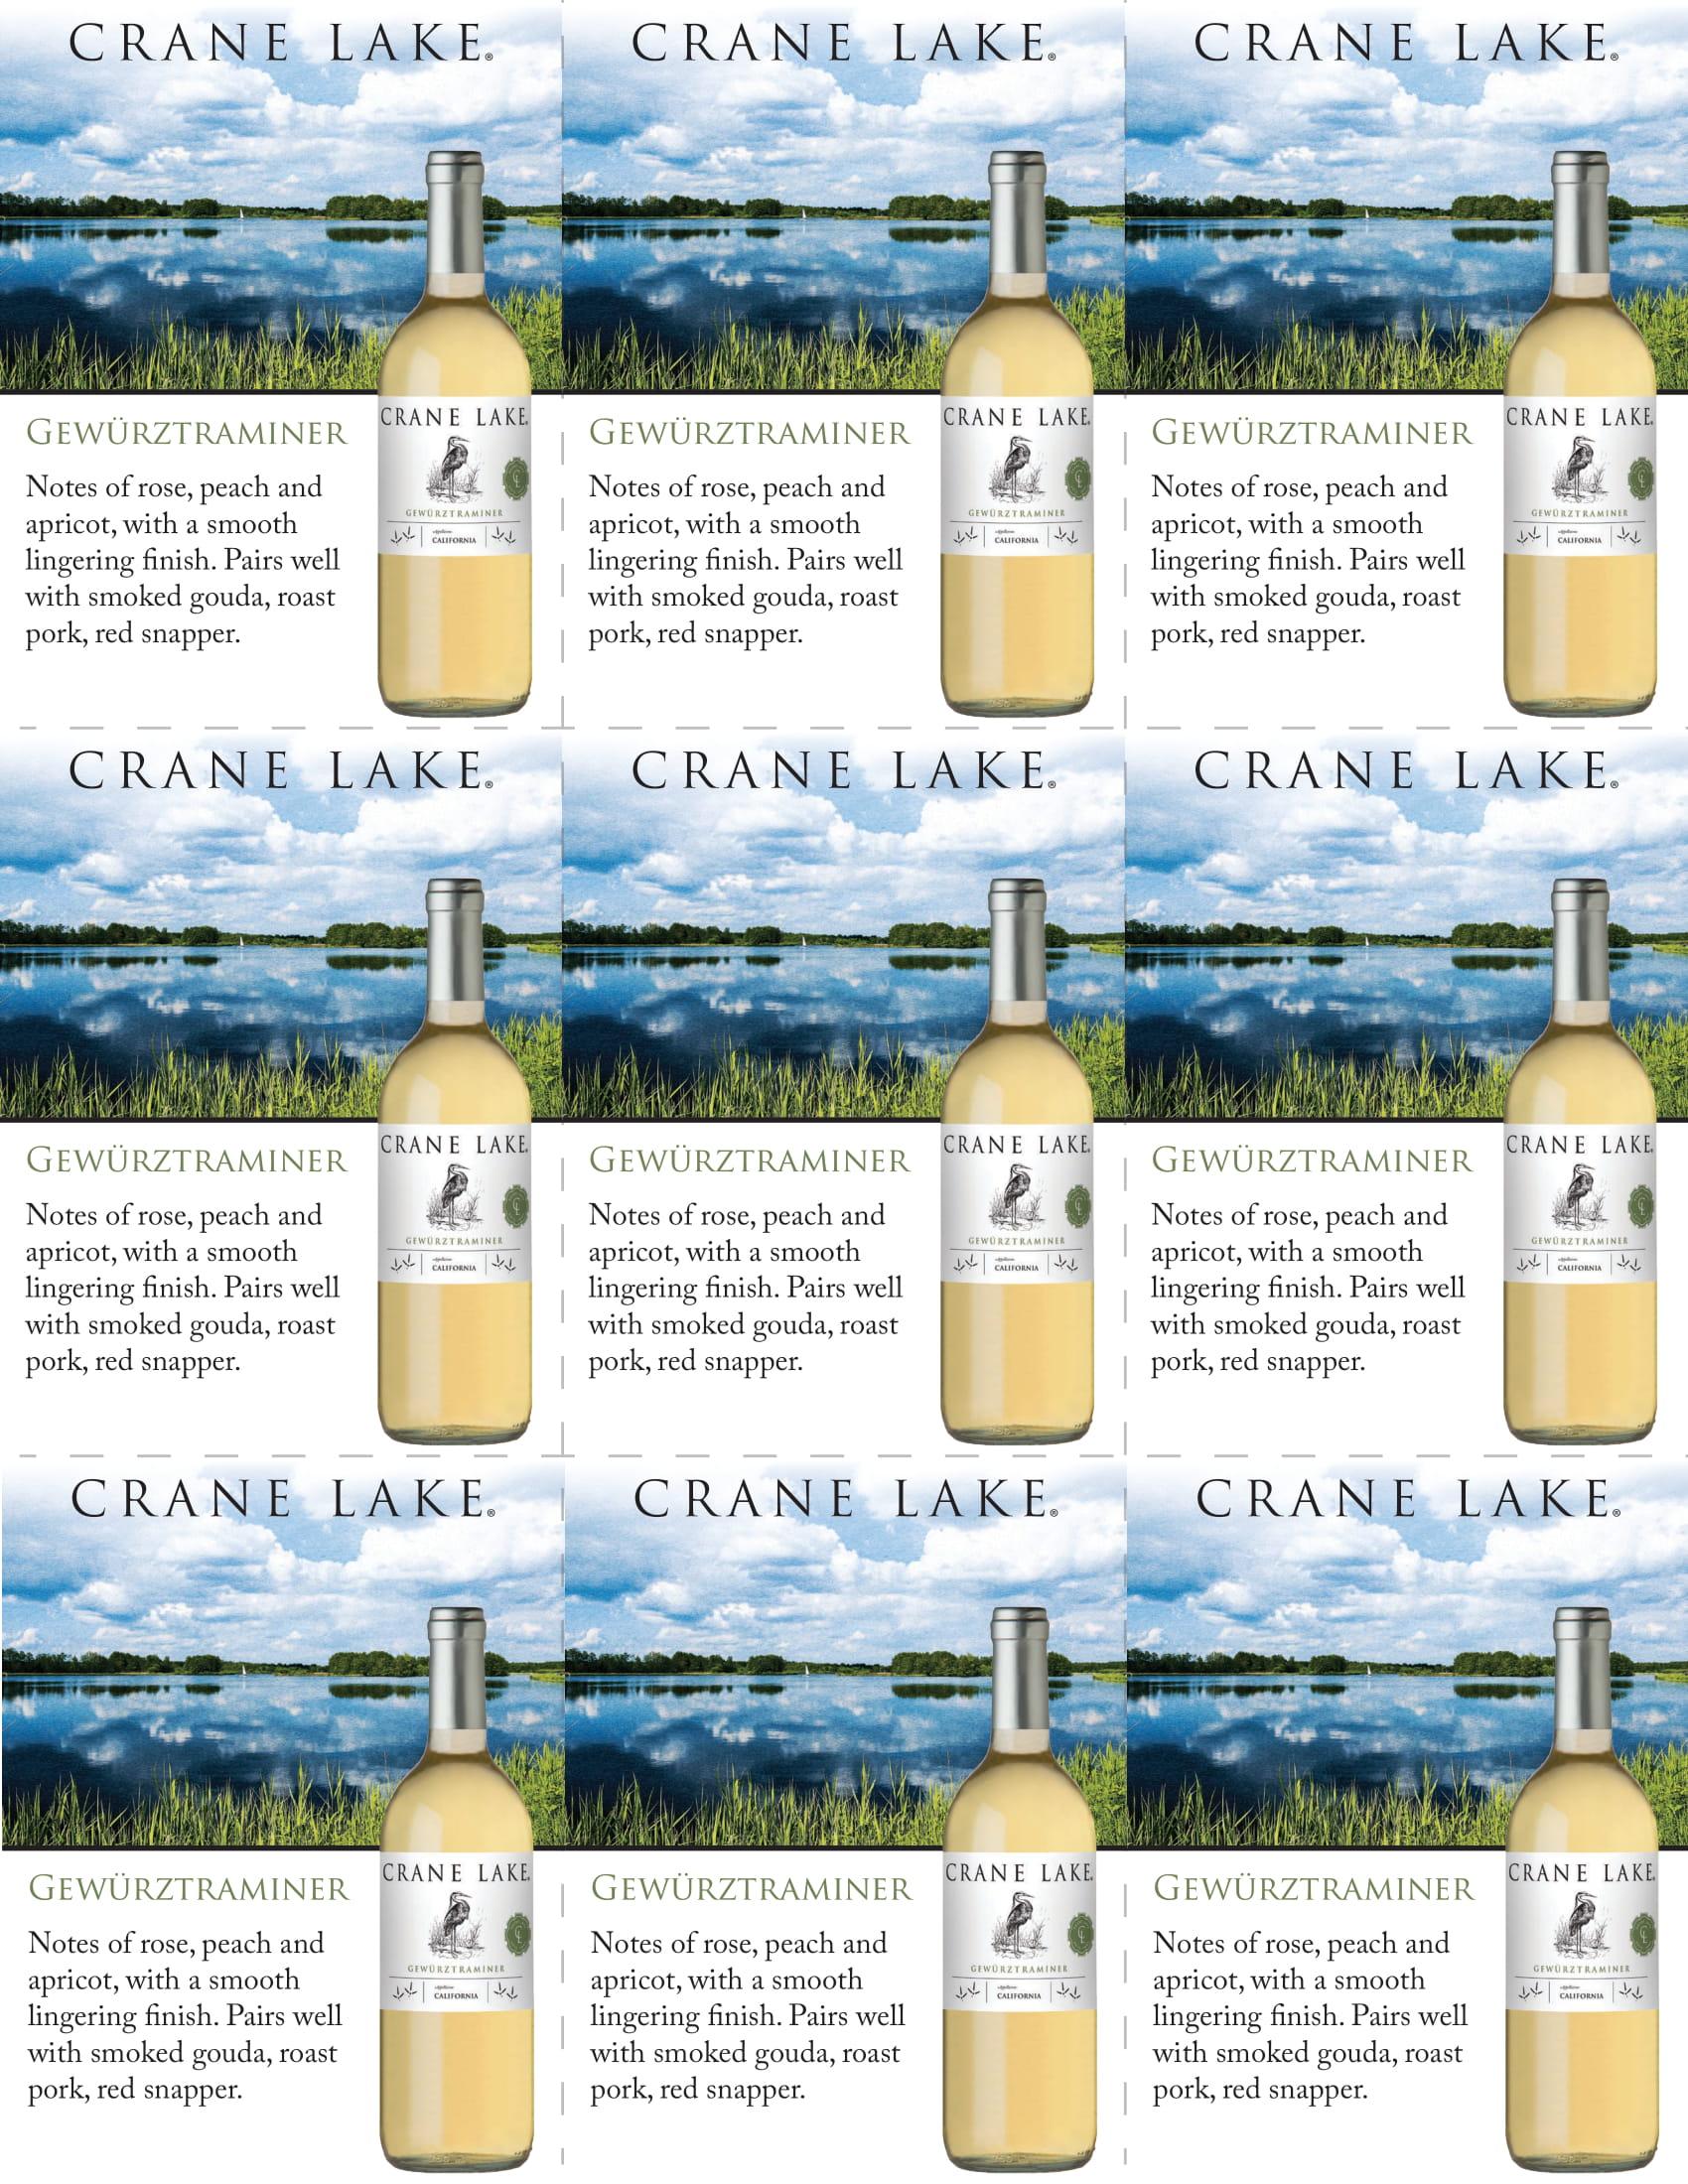 Crane Lake Gerwurztraminer Shelf Talkers